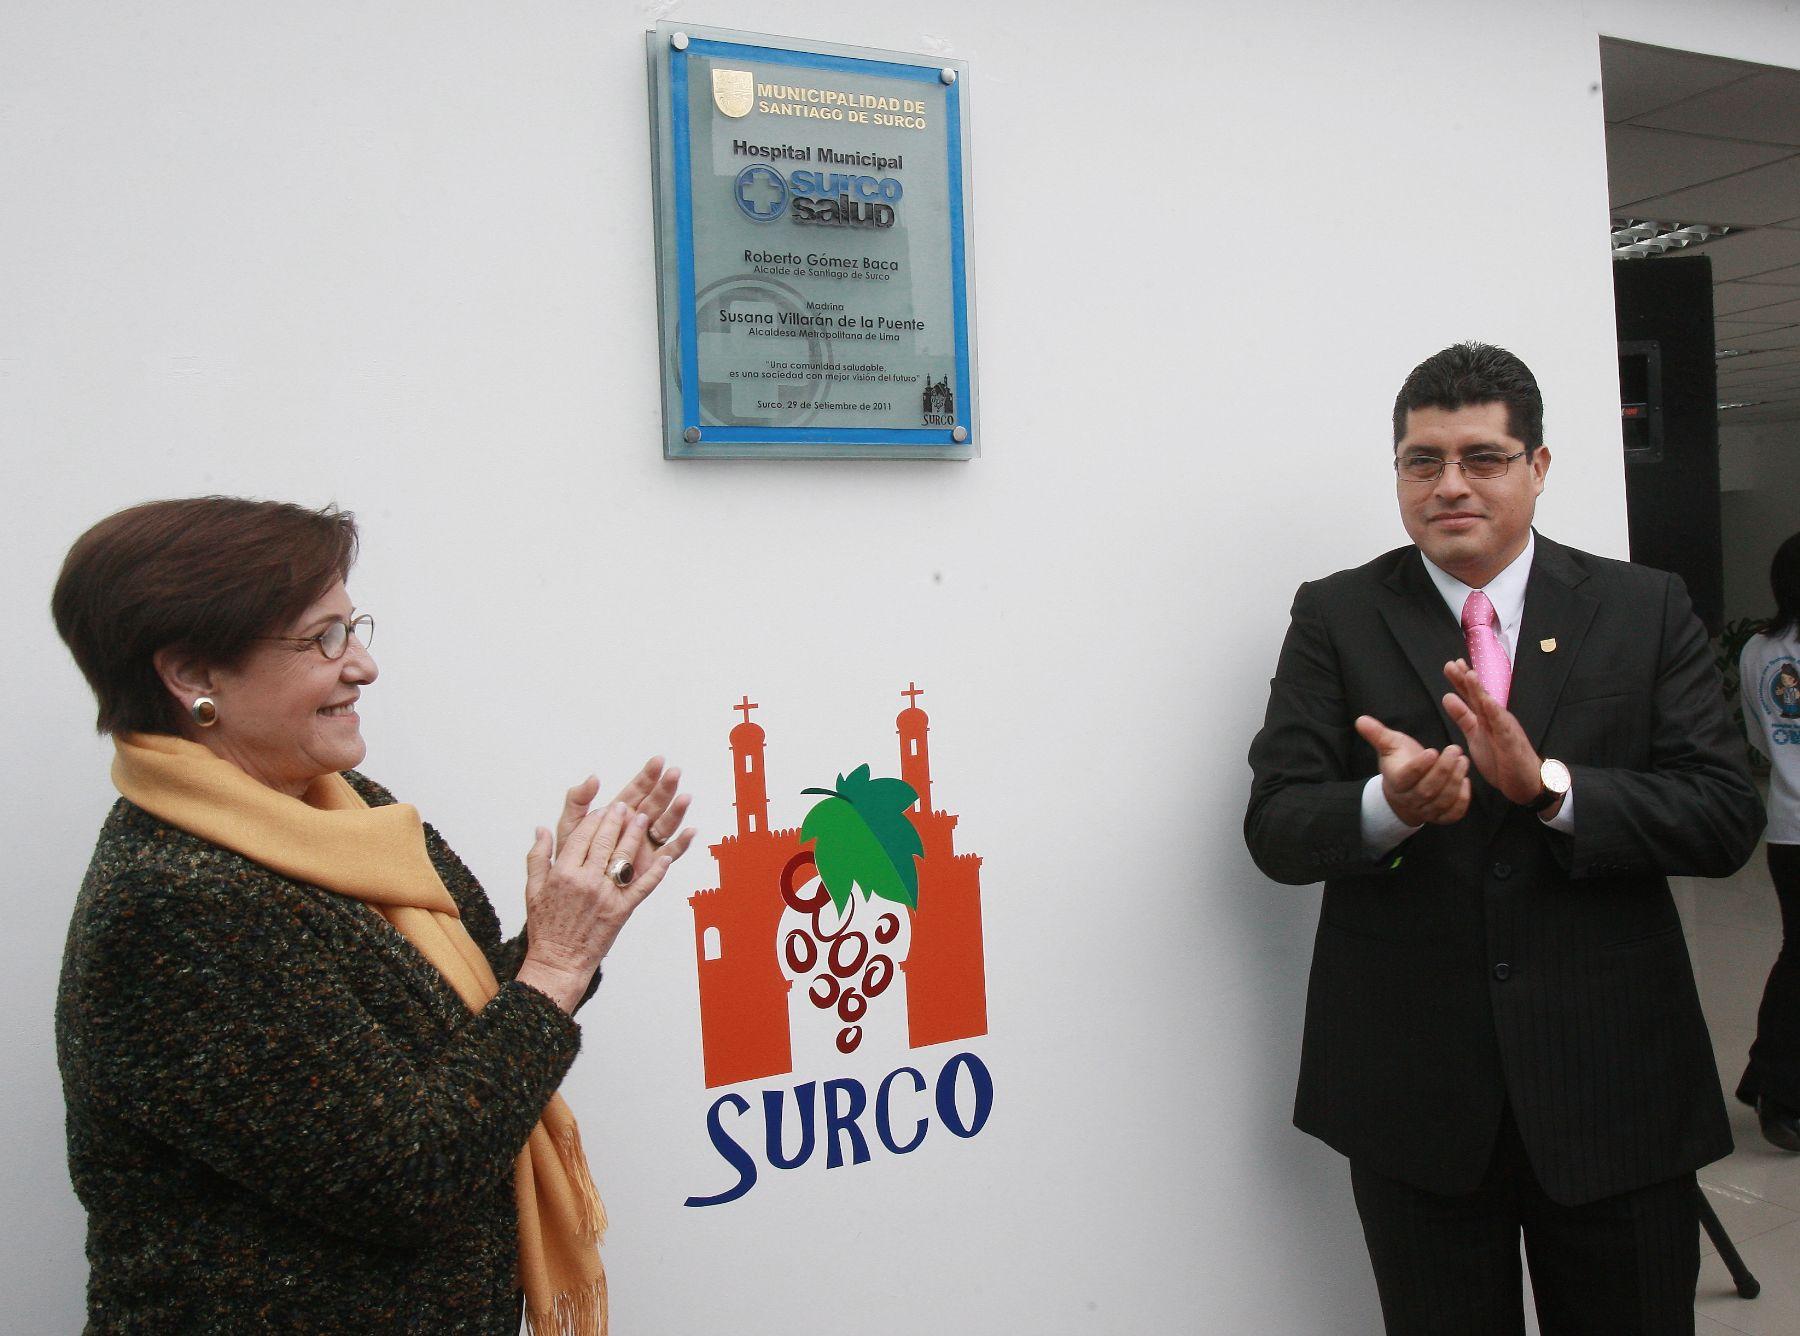 Alcaldesa de Lima, Susana Villarán; y alcalde de Surco, Roberto Gómez, inauguraro primer Hospital Municipal de ese distrito. Foto: ANDINA/Norman Córdova.